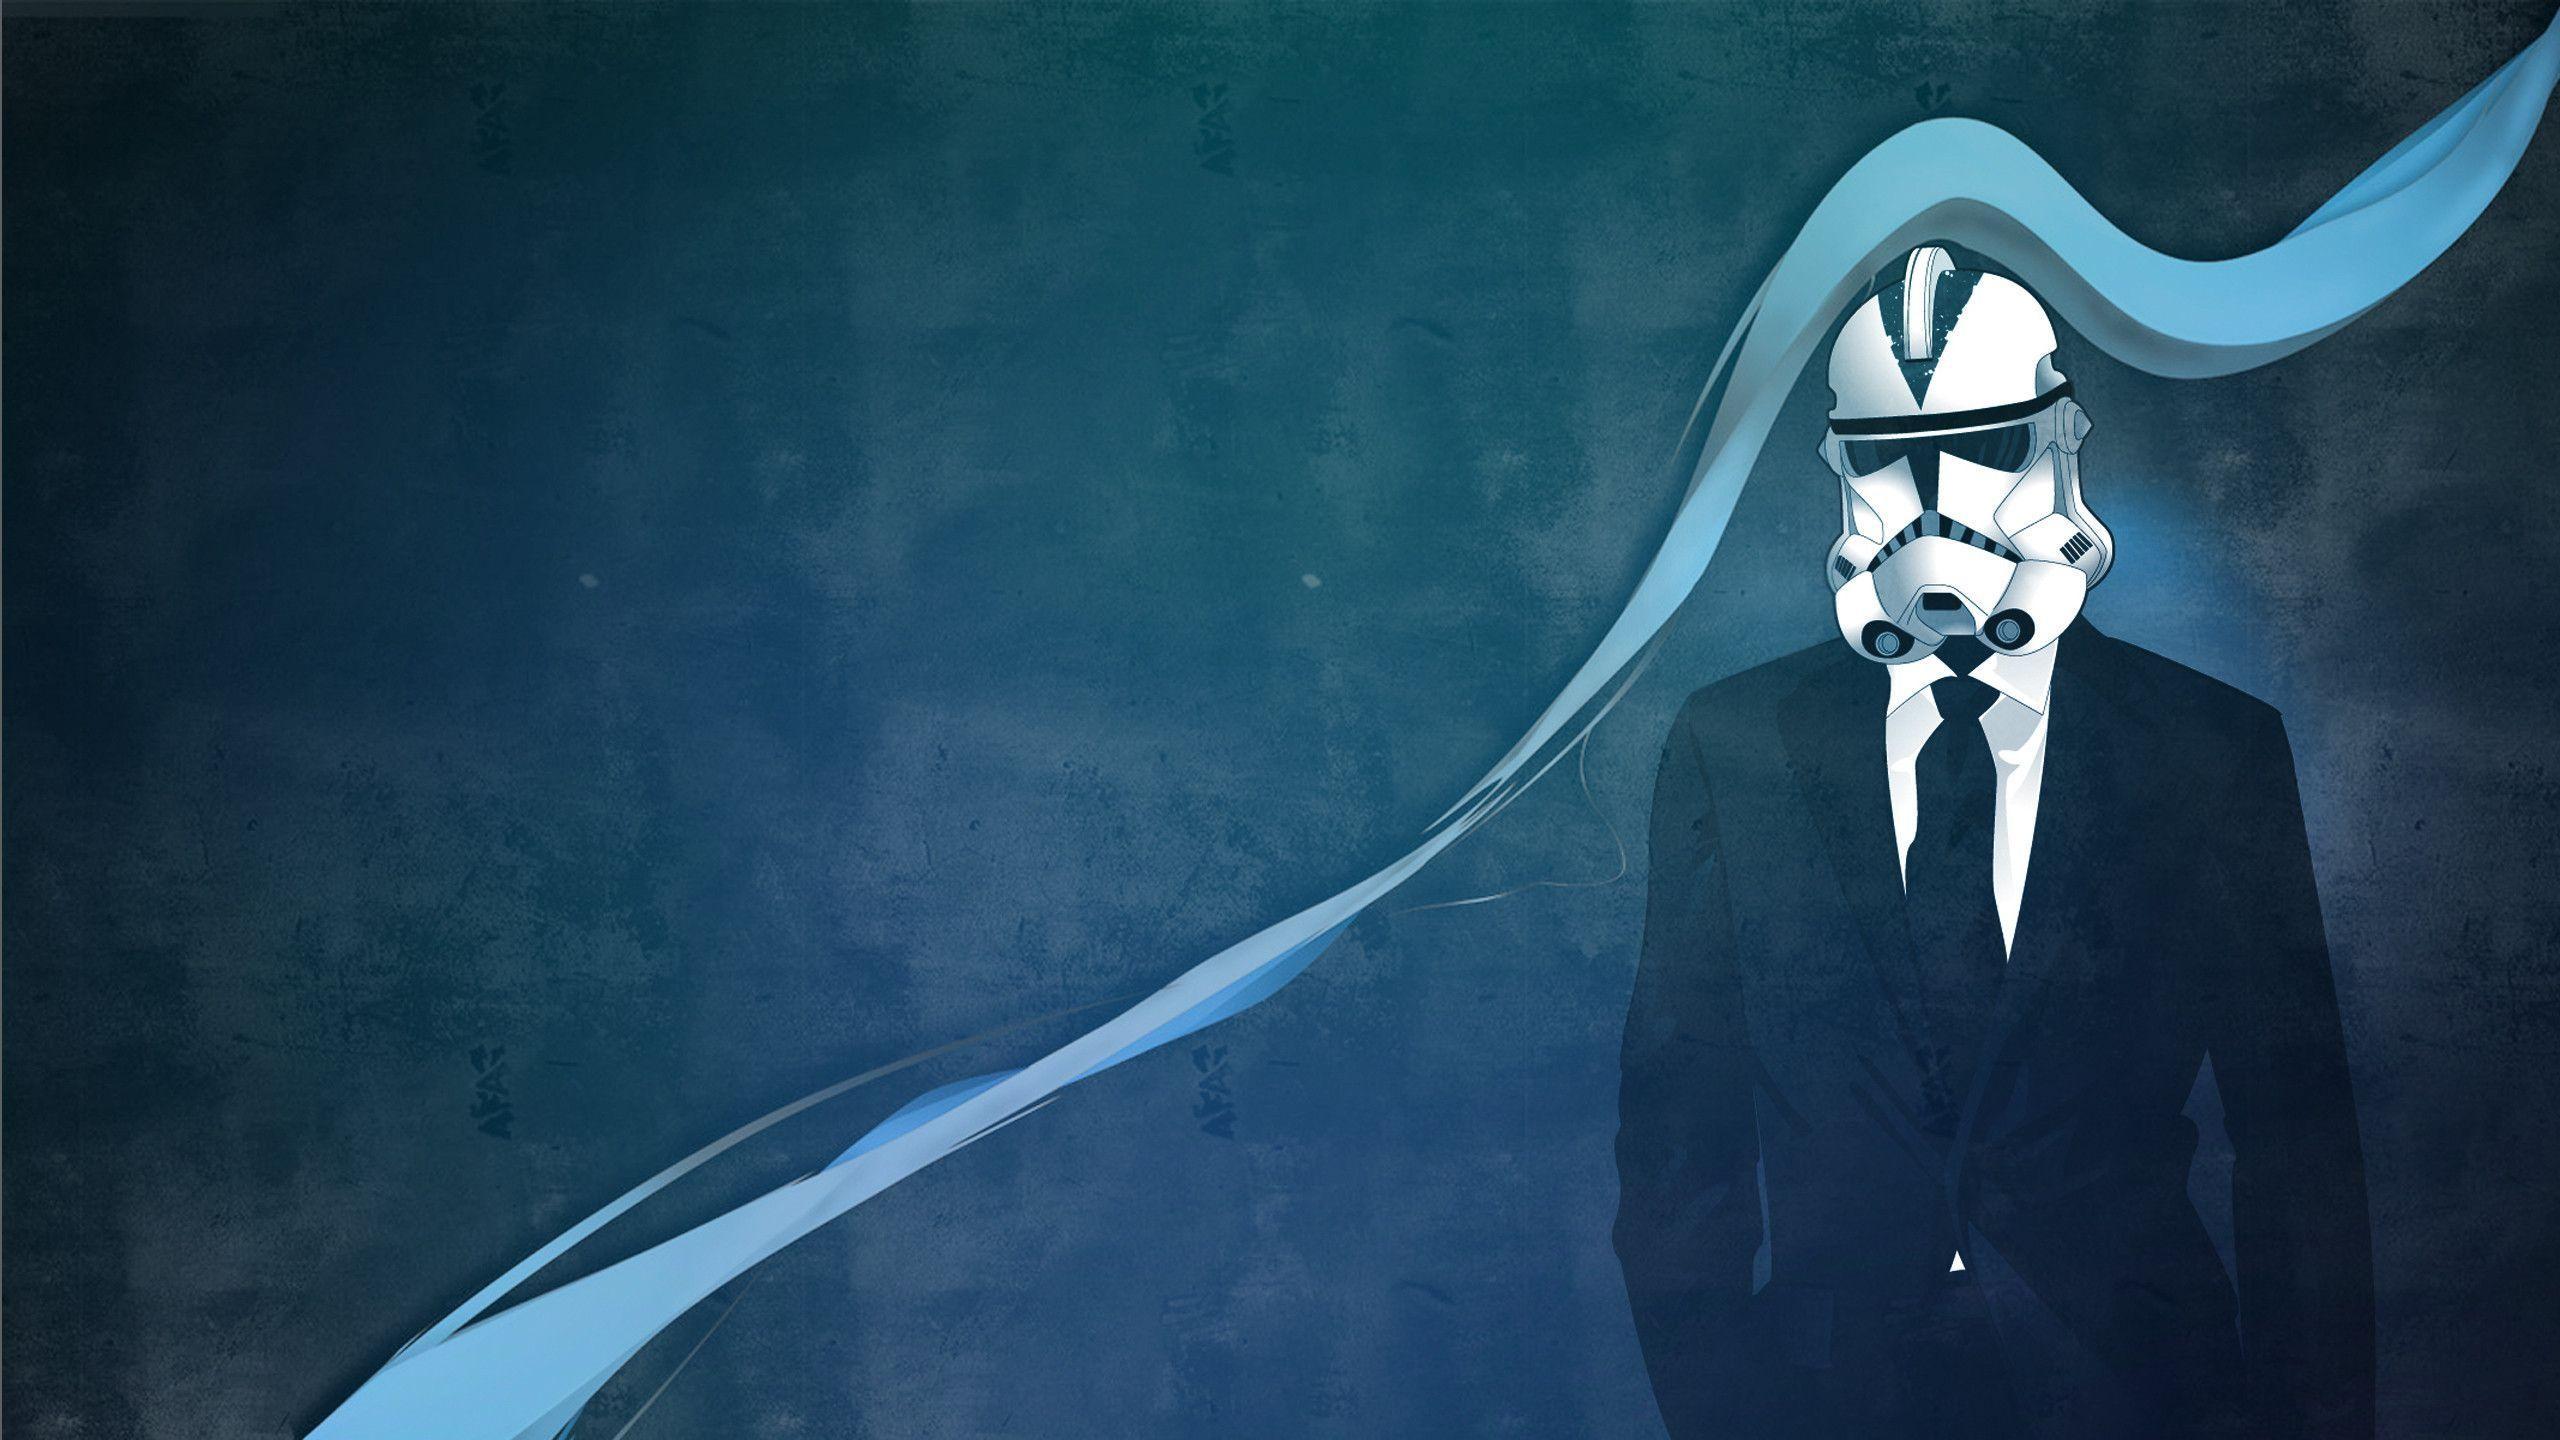 Star Wars First Order Wallpaper – WallpaperSafari